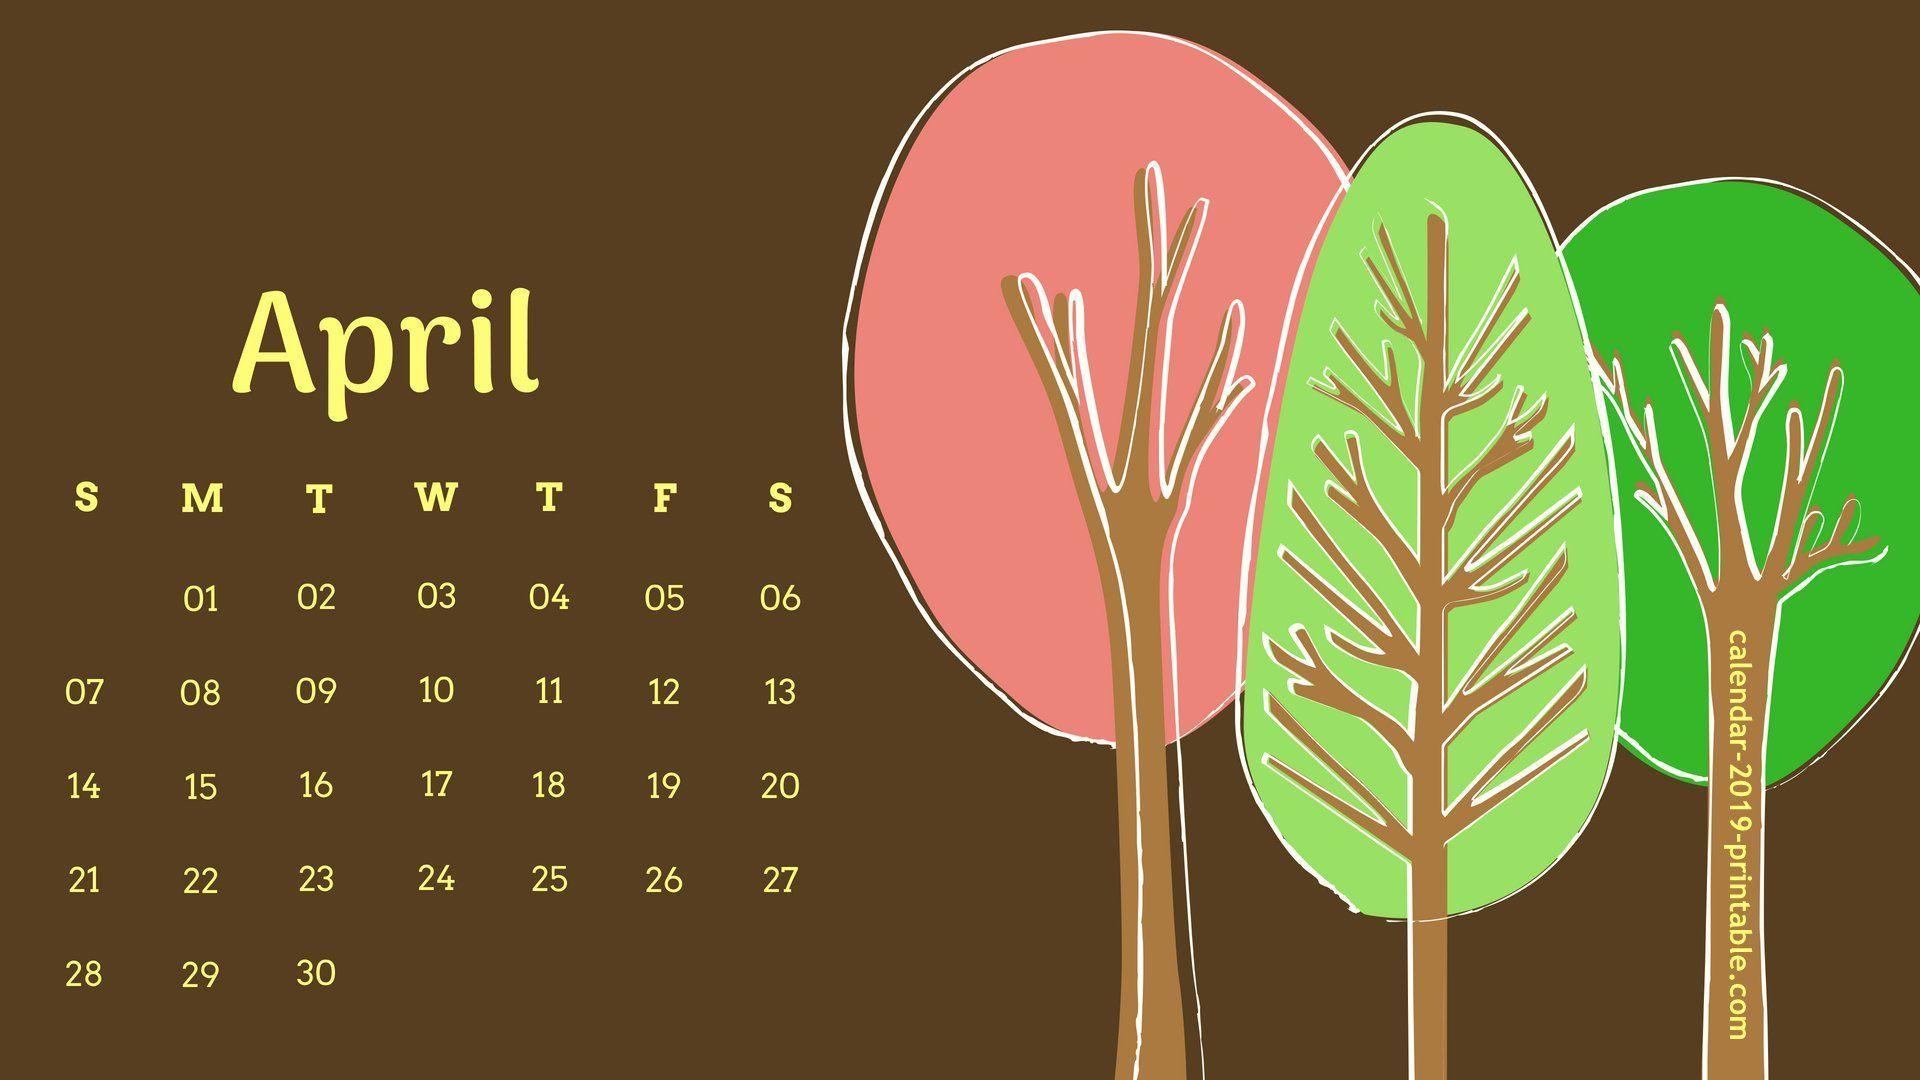 April 2020 Desktop Calendar Wallpaper Calendar Wallpaper Desktop Calendar 2019 Calendar